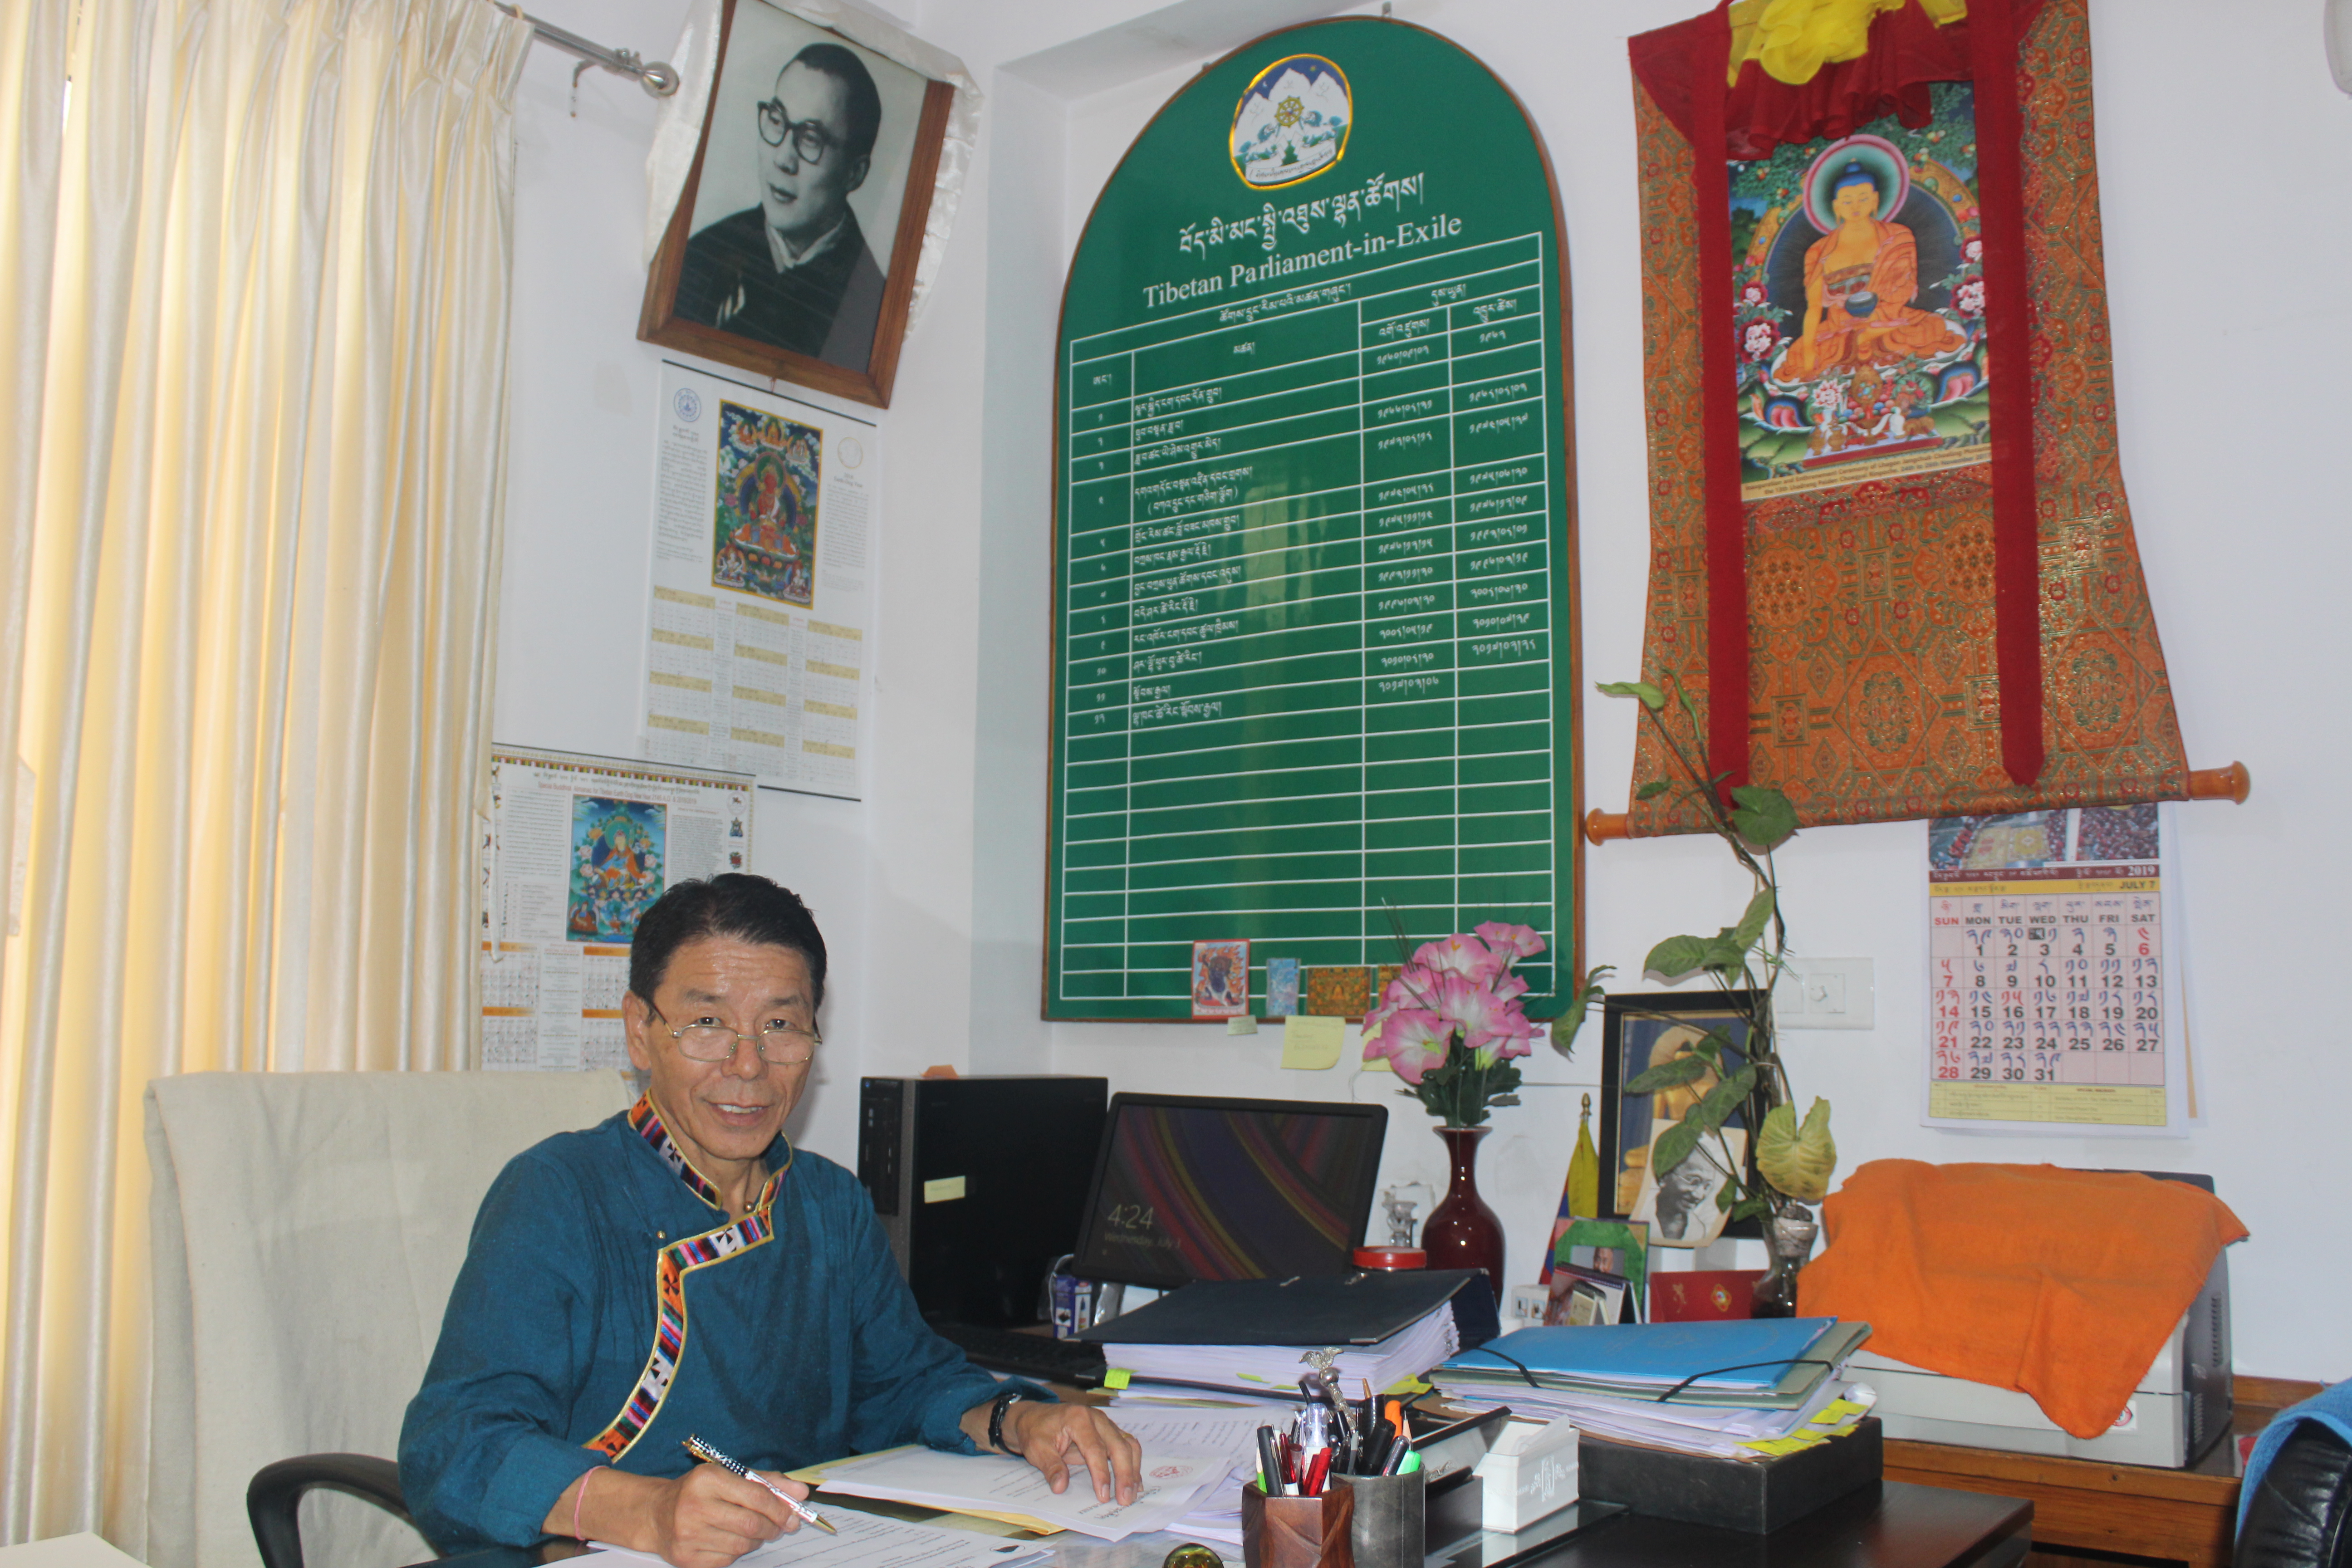 Curriculum Vitae of Mr. Tsering Topgyal Lhakhang, Secretary, Tibetan Parliamentary Secretariat